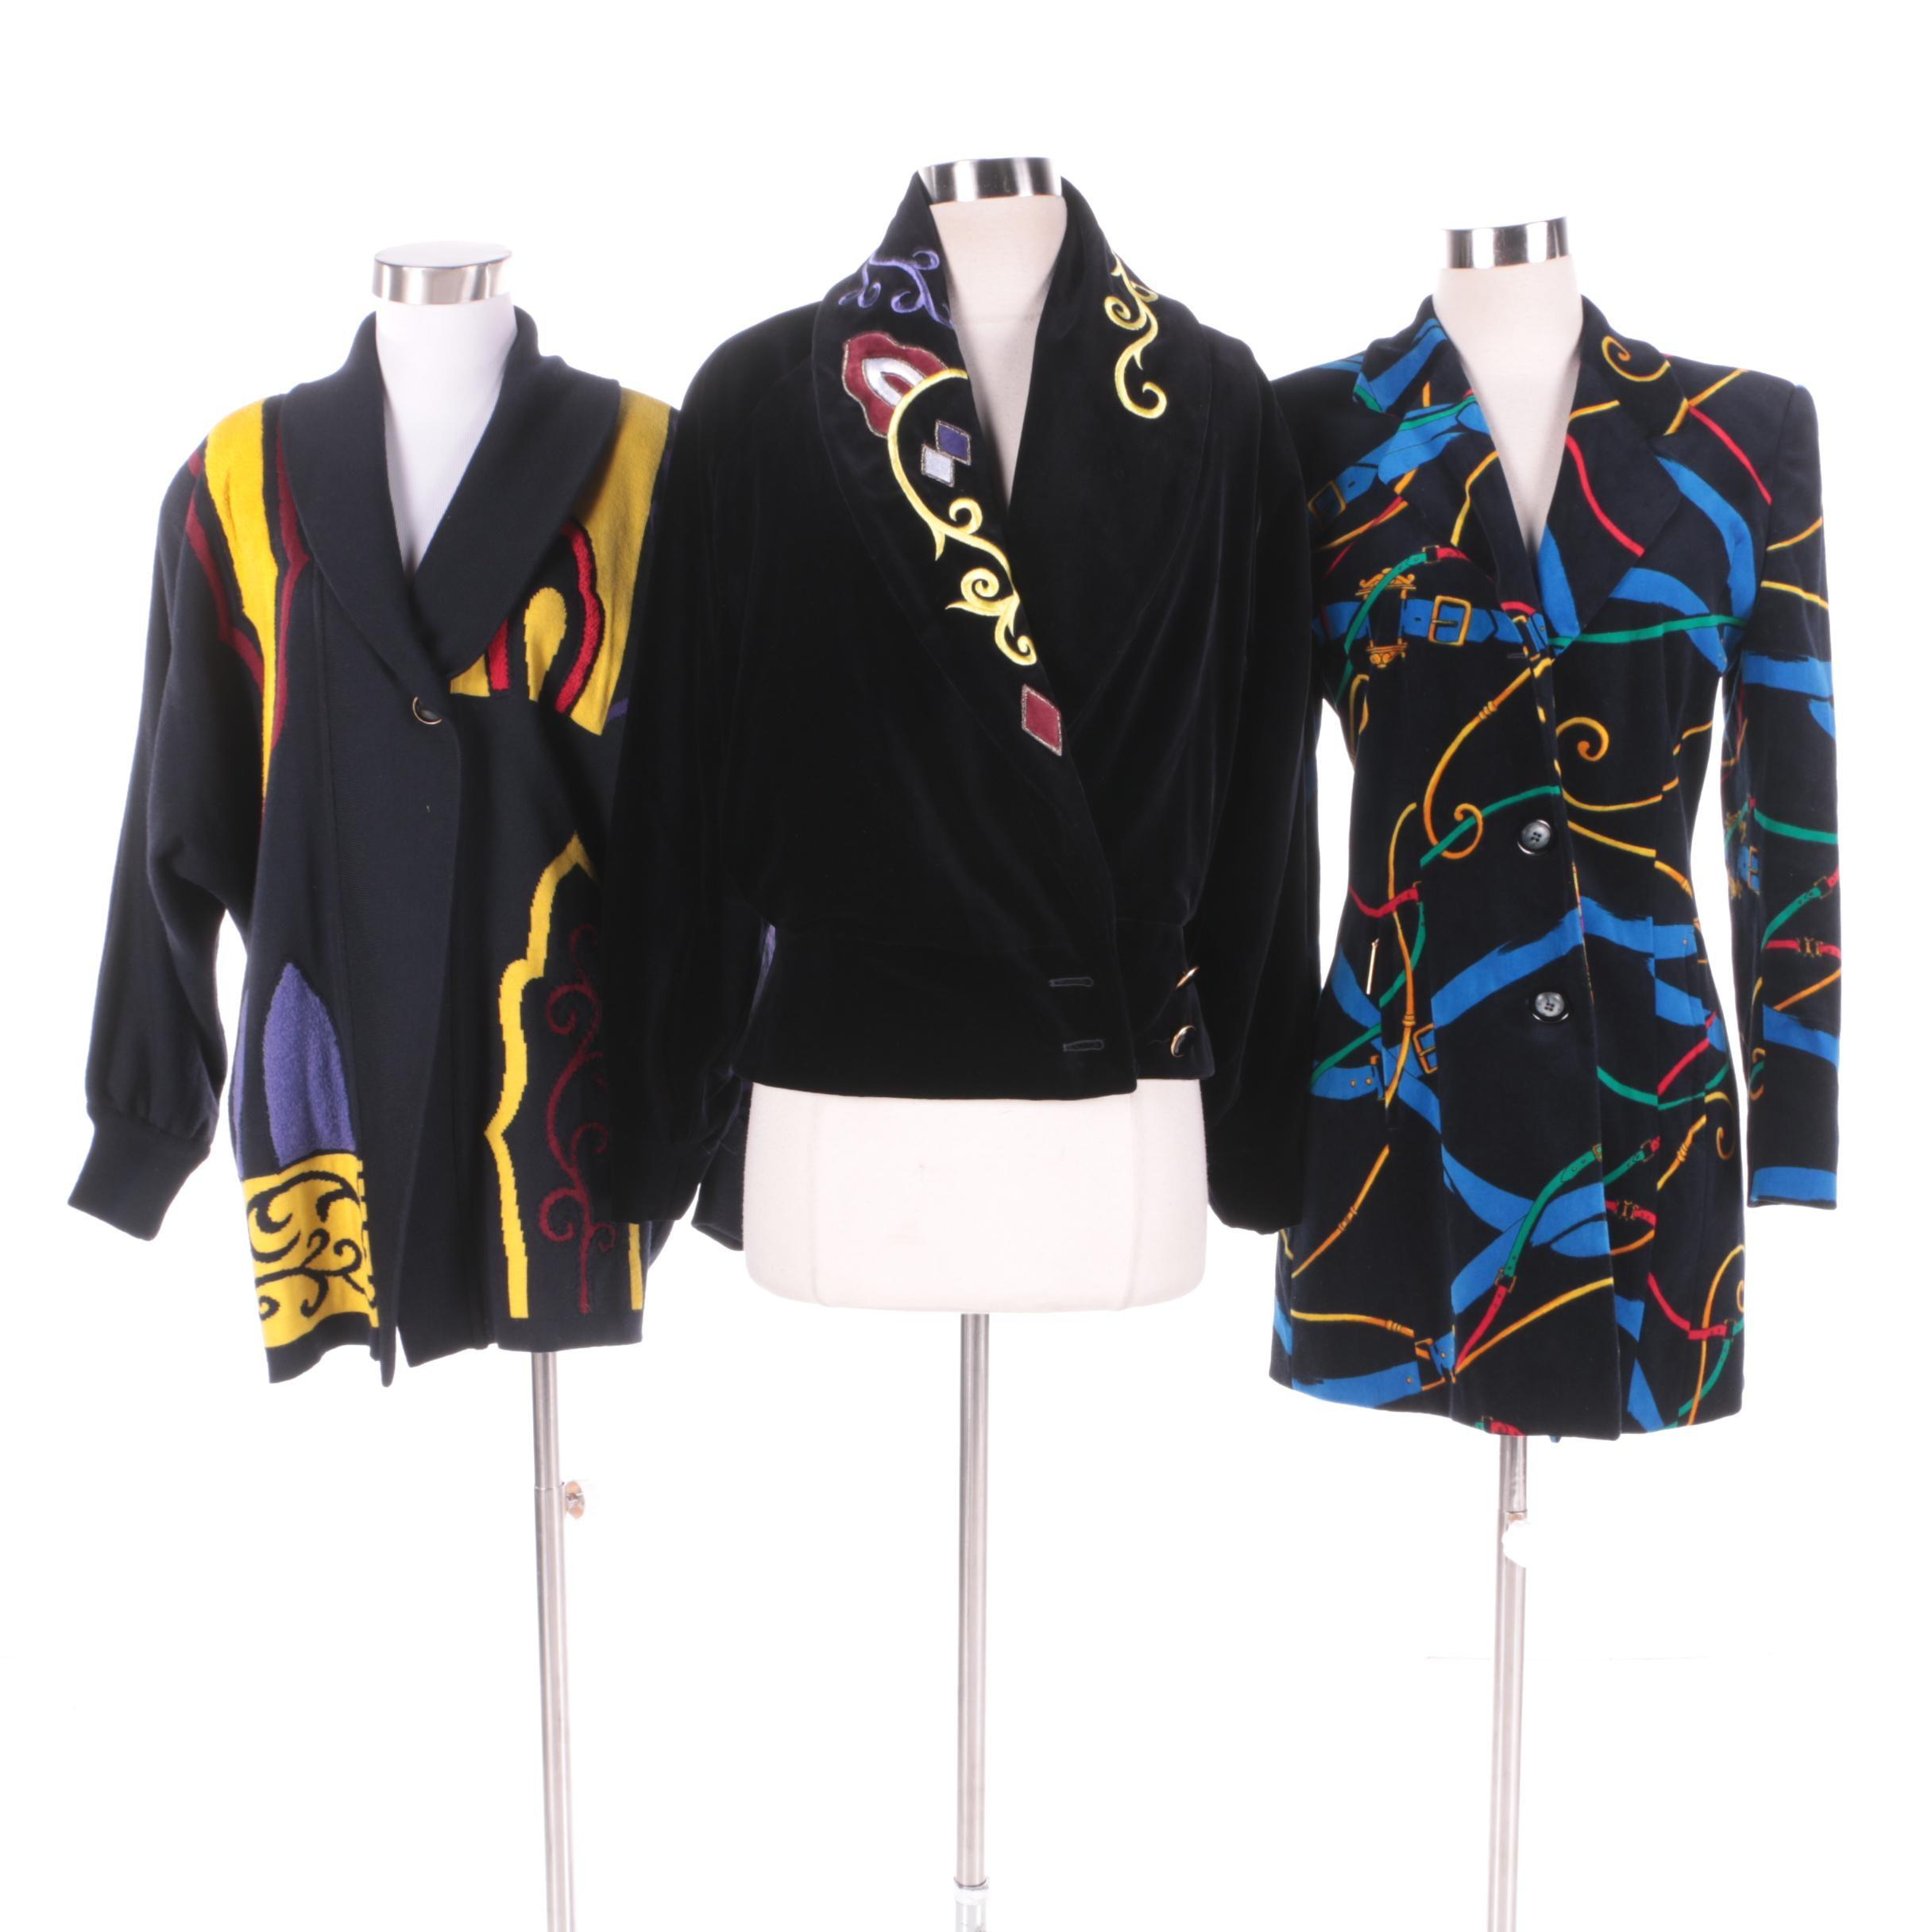 Women's Vintage Laurèl Jacket and Blazer